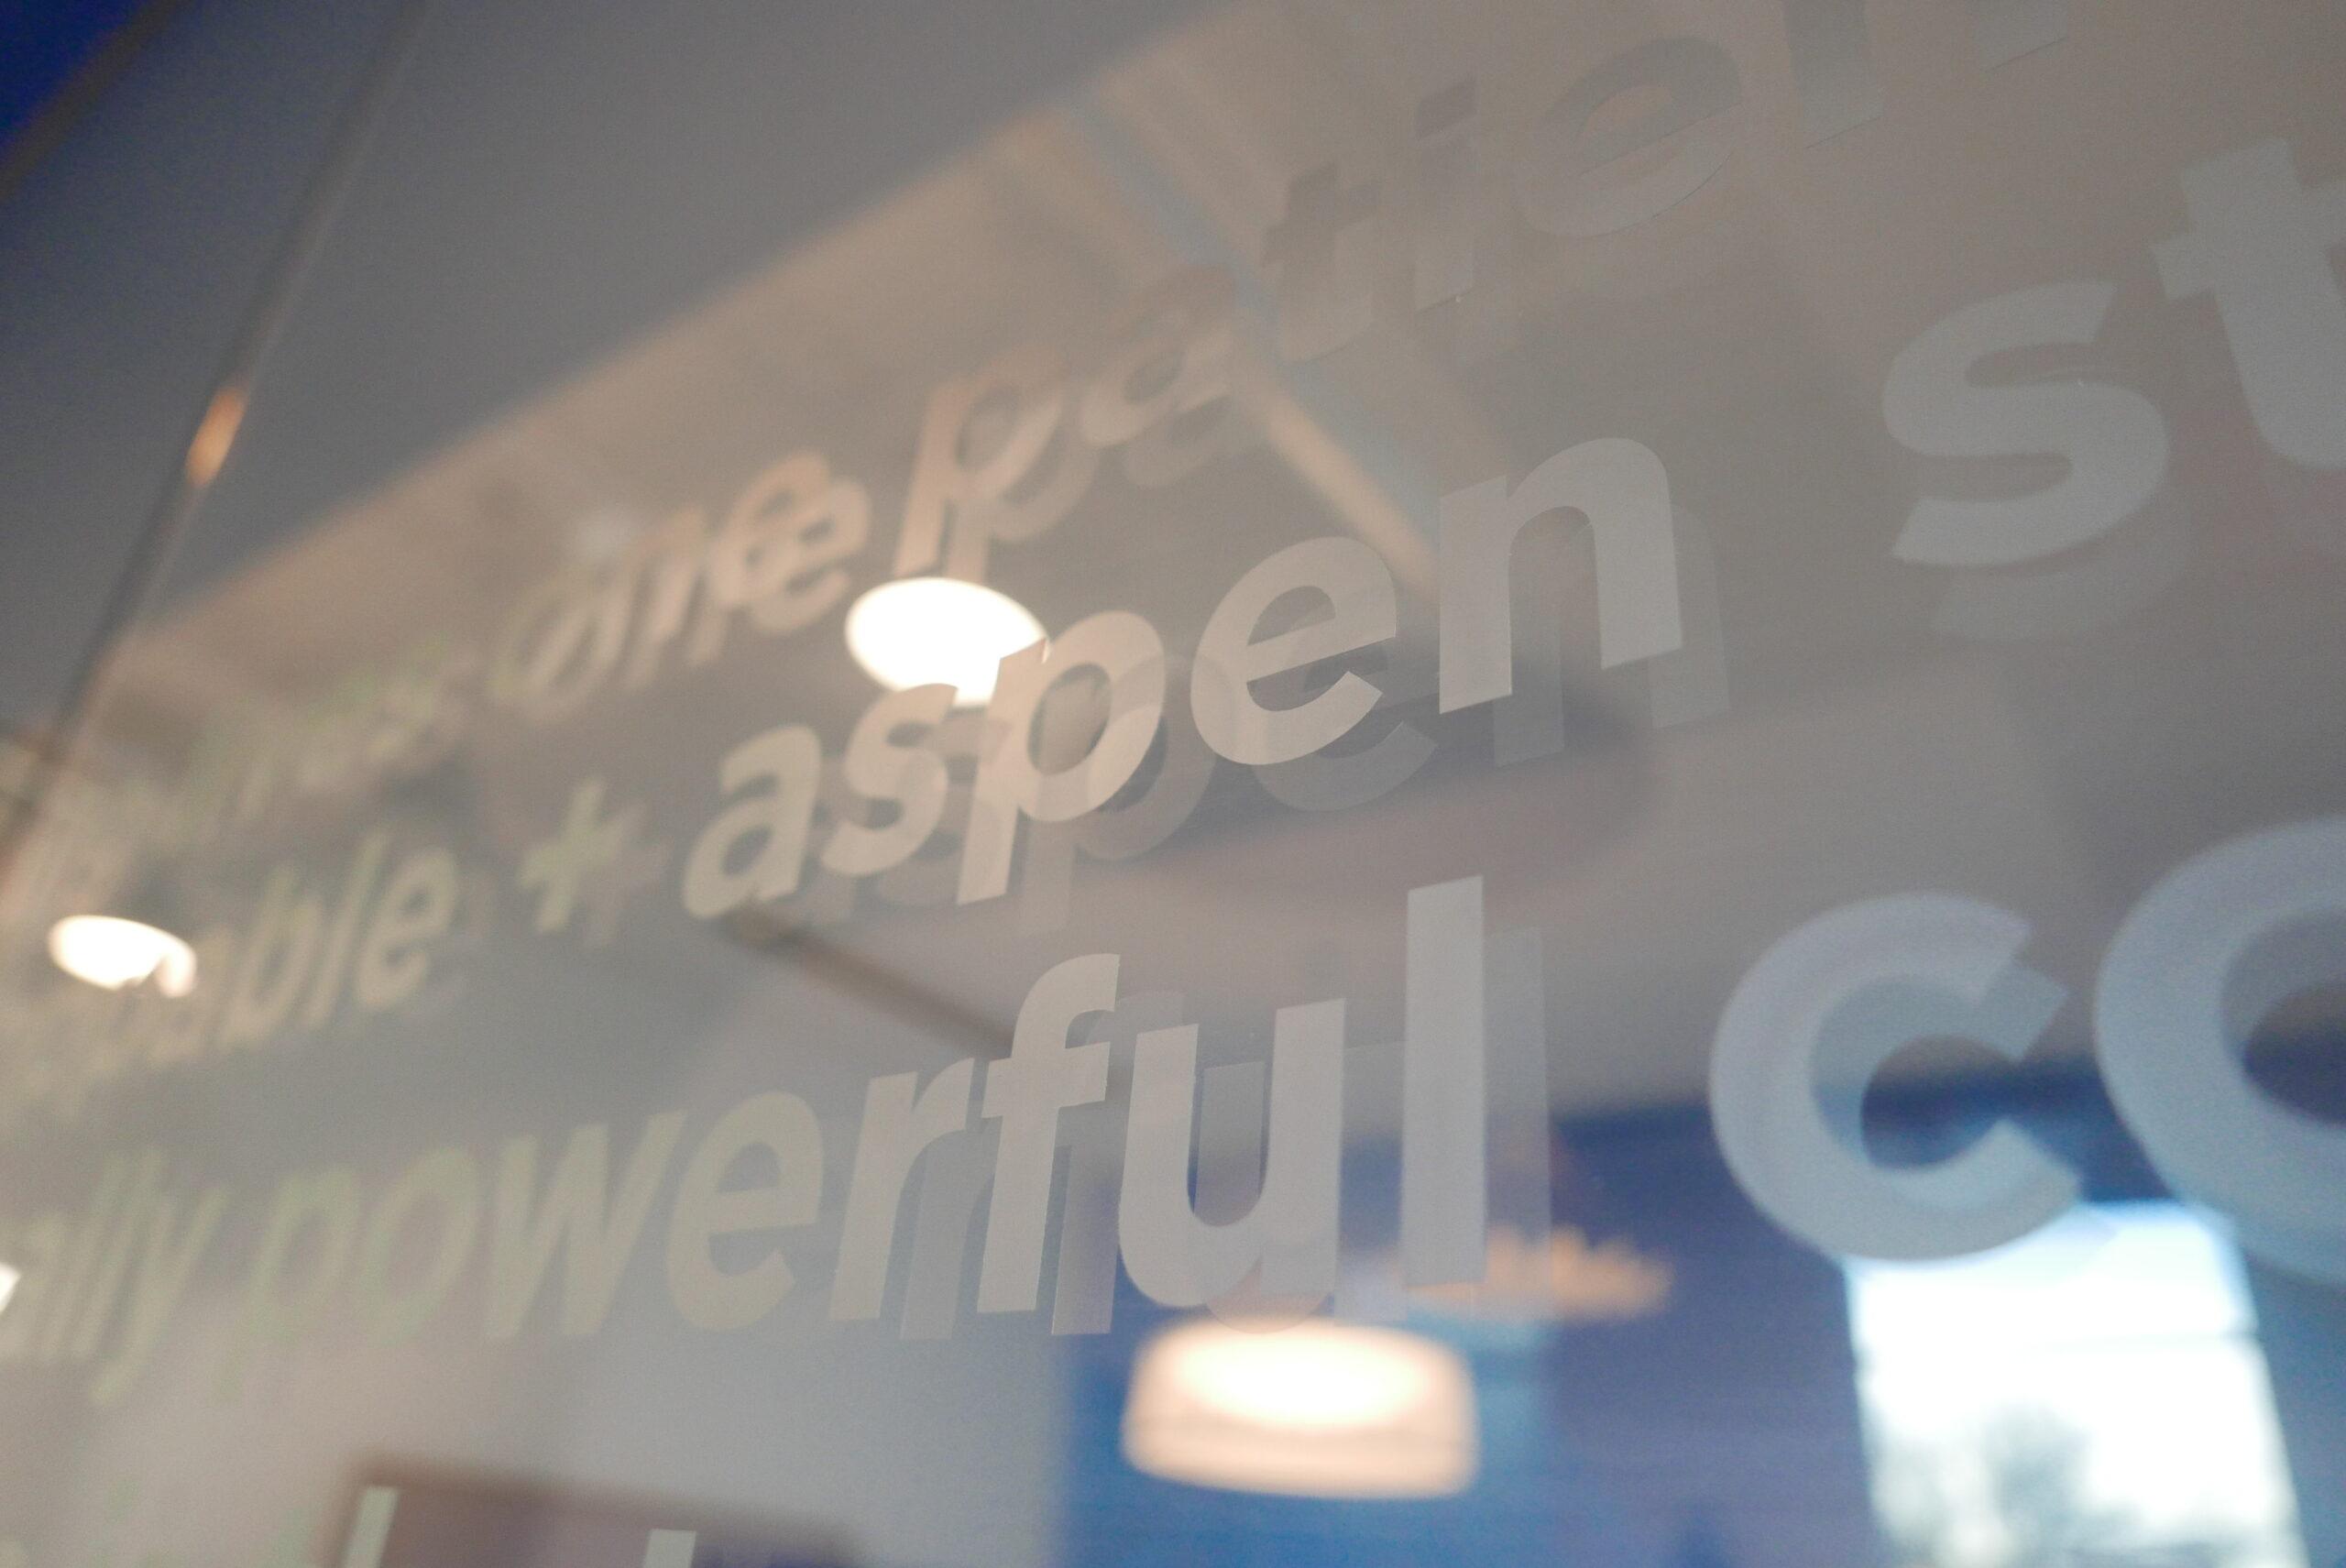 Forcade Bold Brand Culture Window Graphics